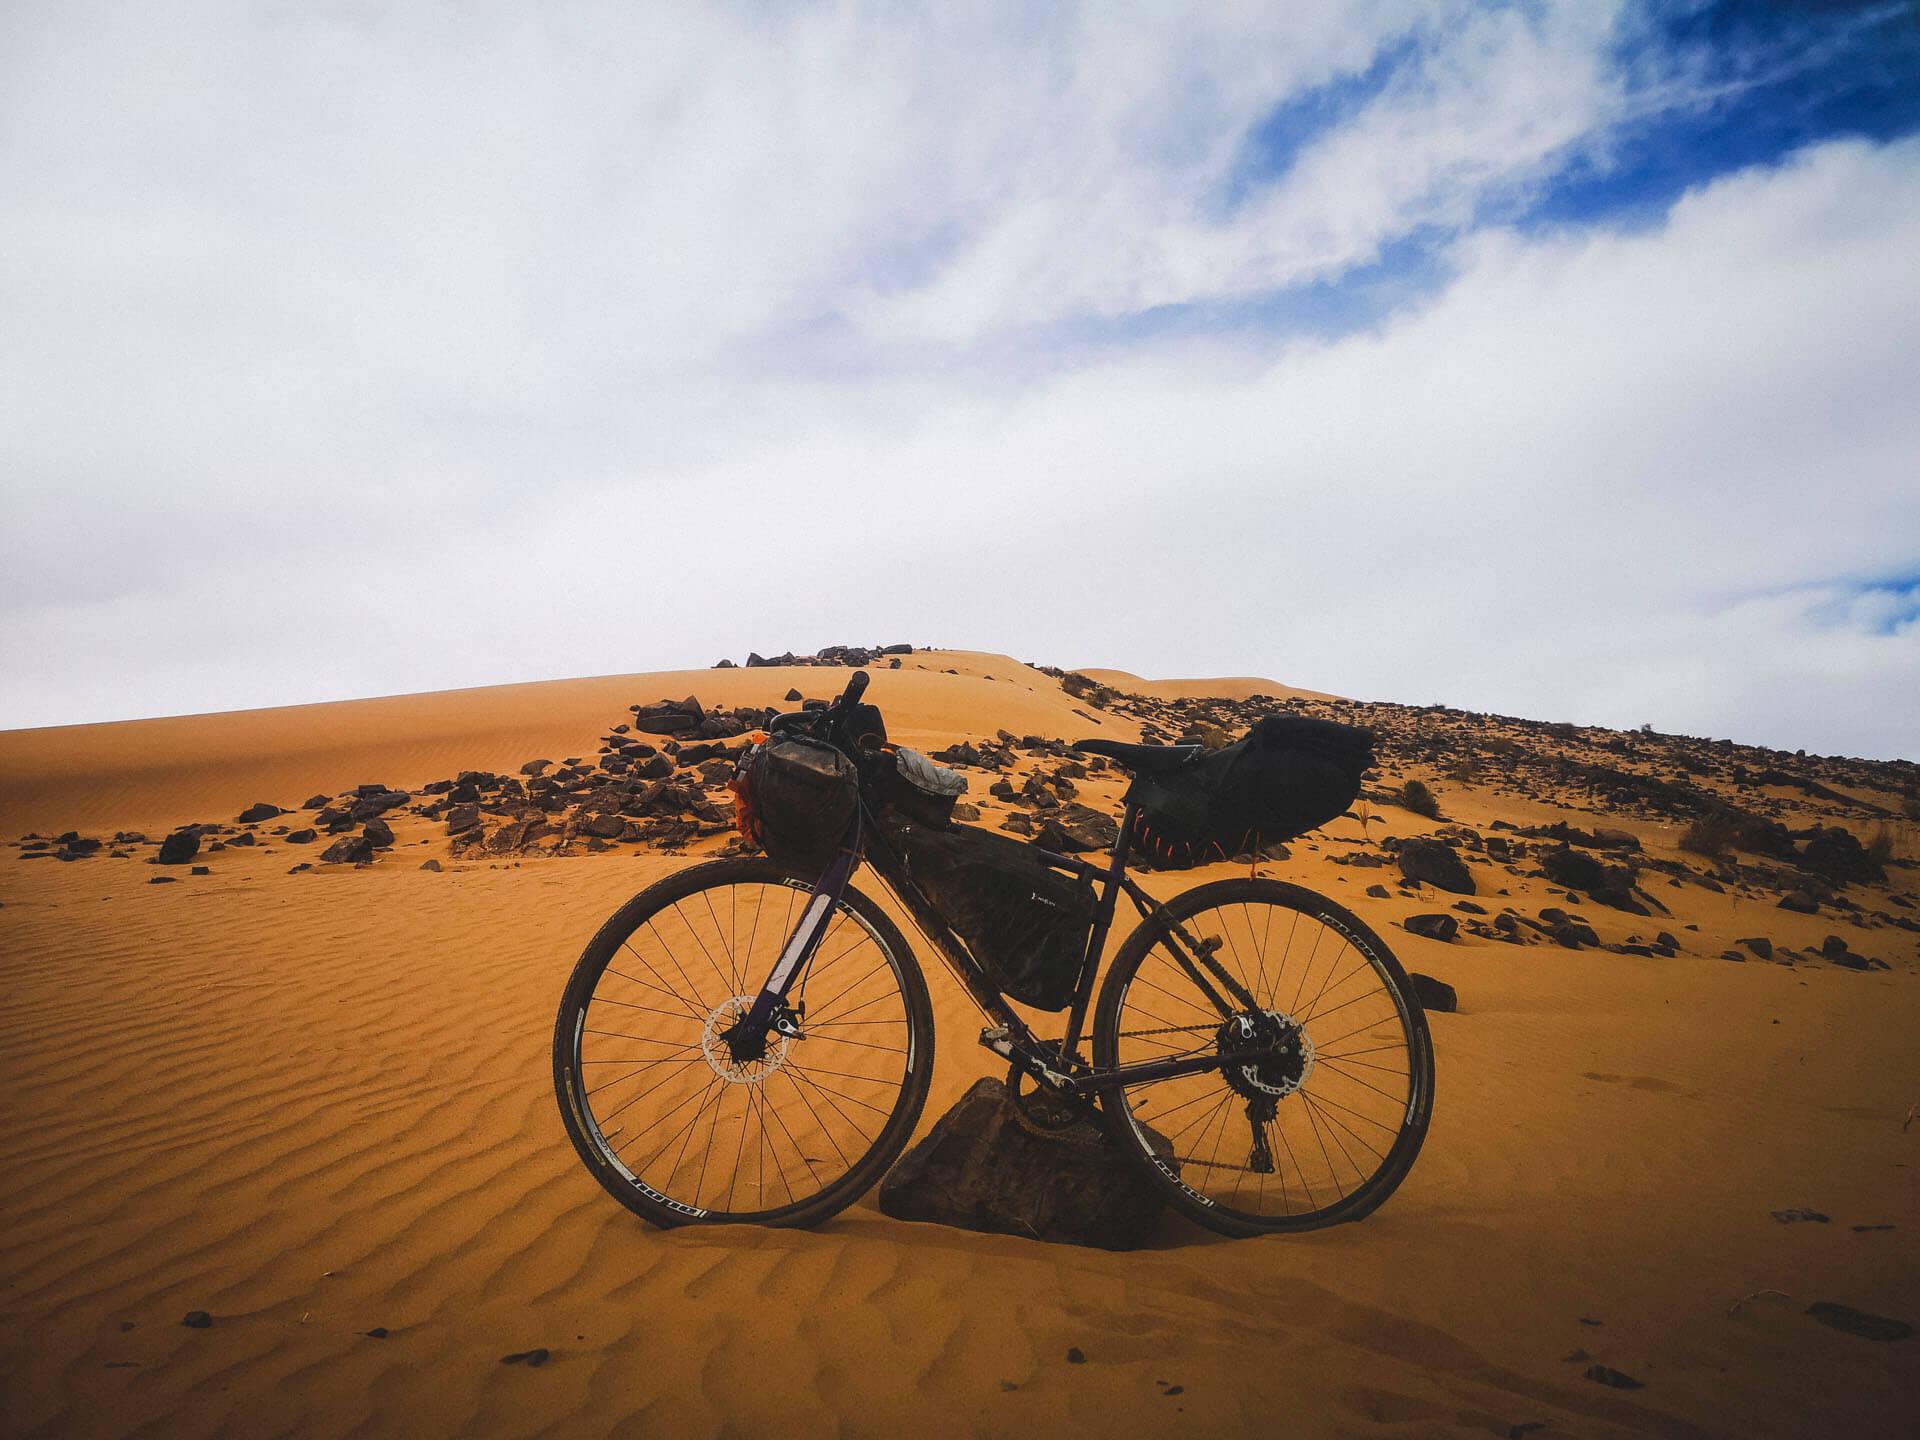 marocco-114043